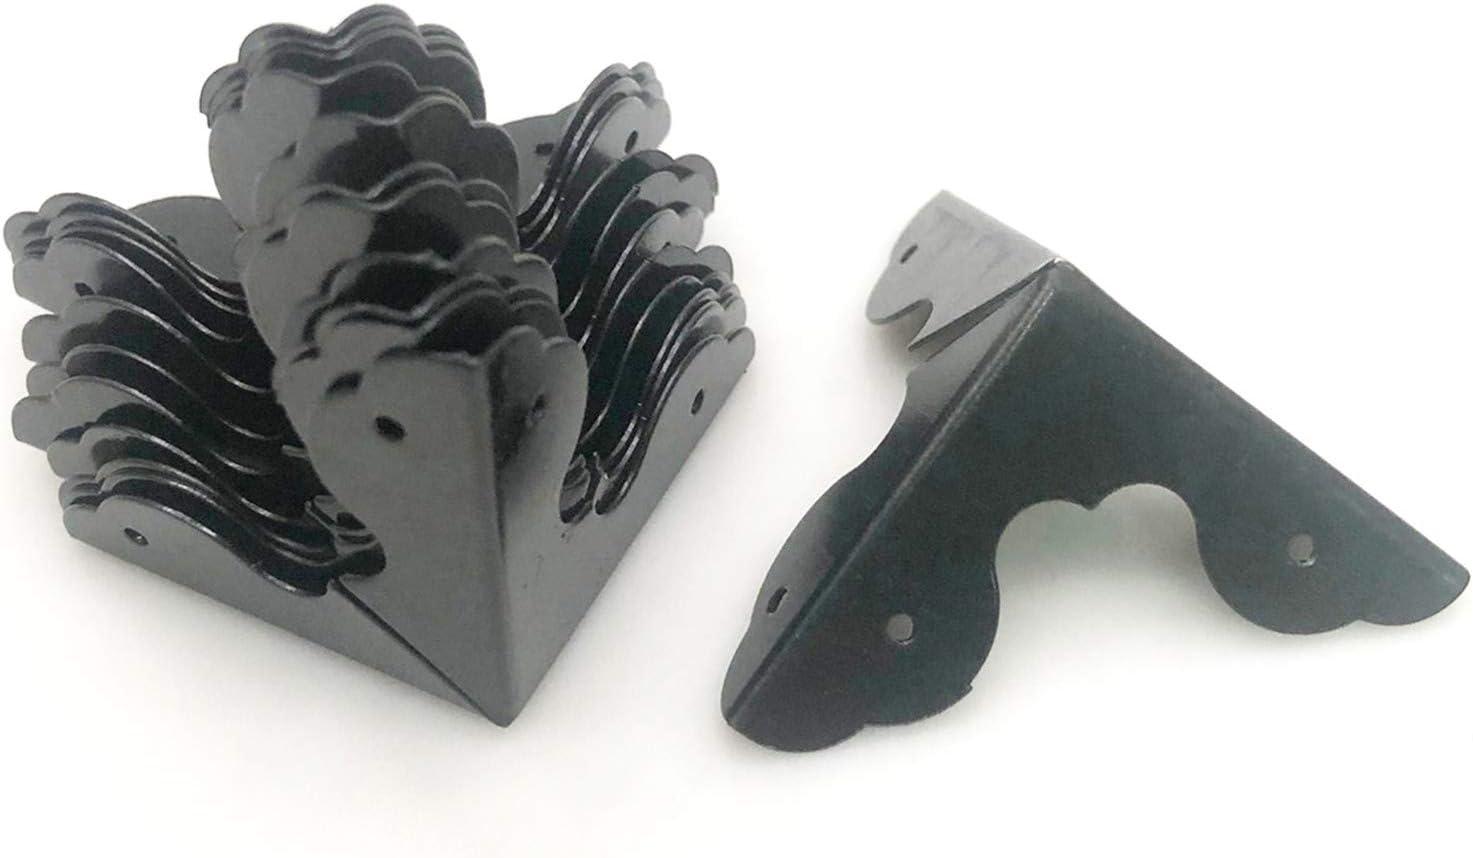 XMHF 12PCS Box Corner Protector Triangle Metal Case Wooden Box Edge Safety Guard for Furniture Decor 1-1/4